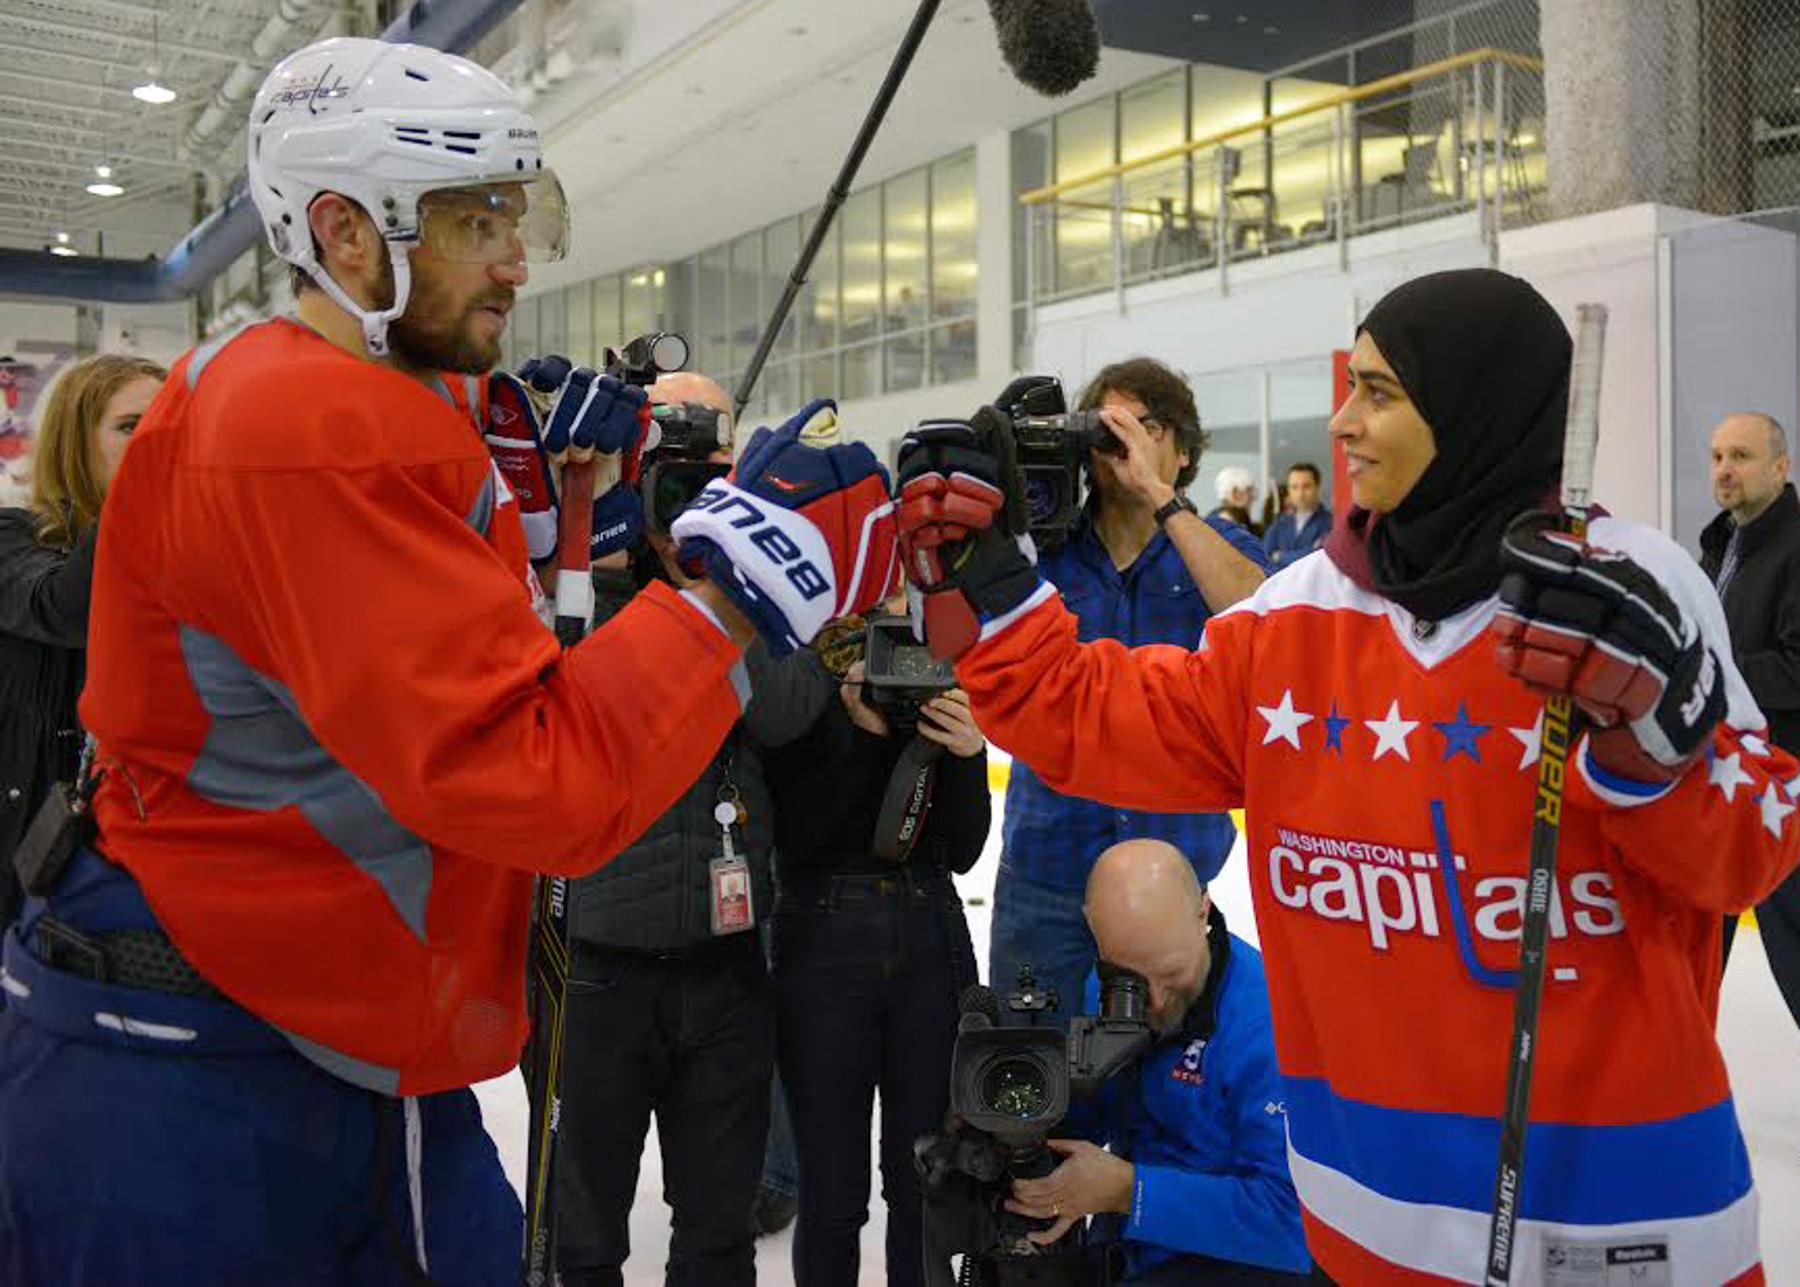 Hockey players bumping fists (© Washington Post via Getty Images)